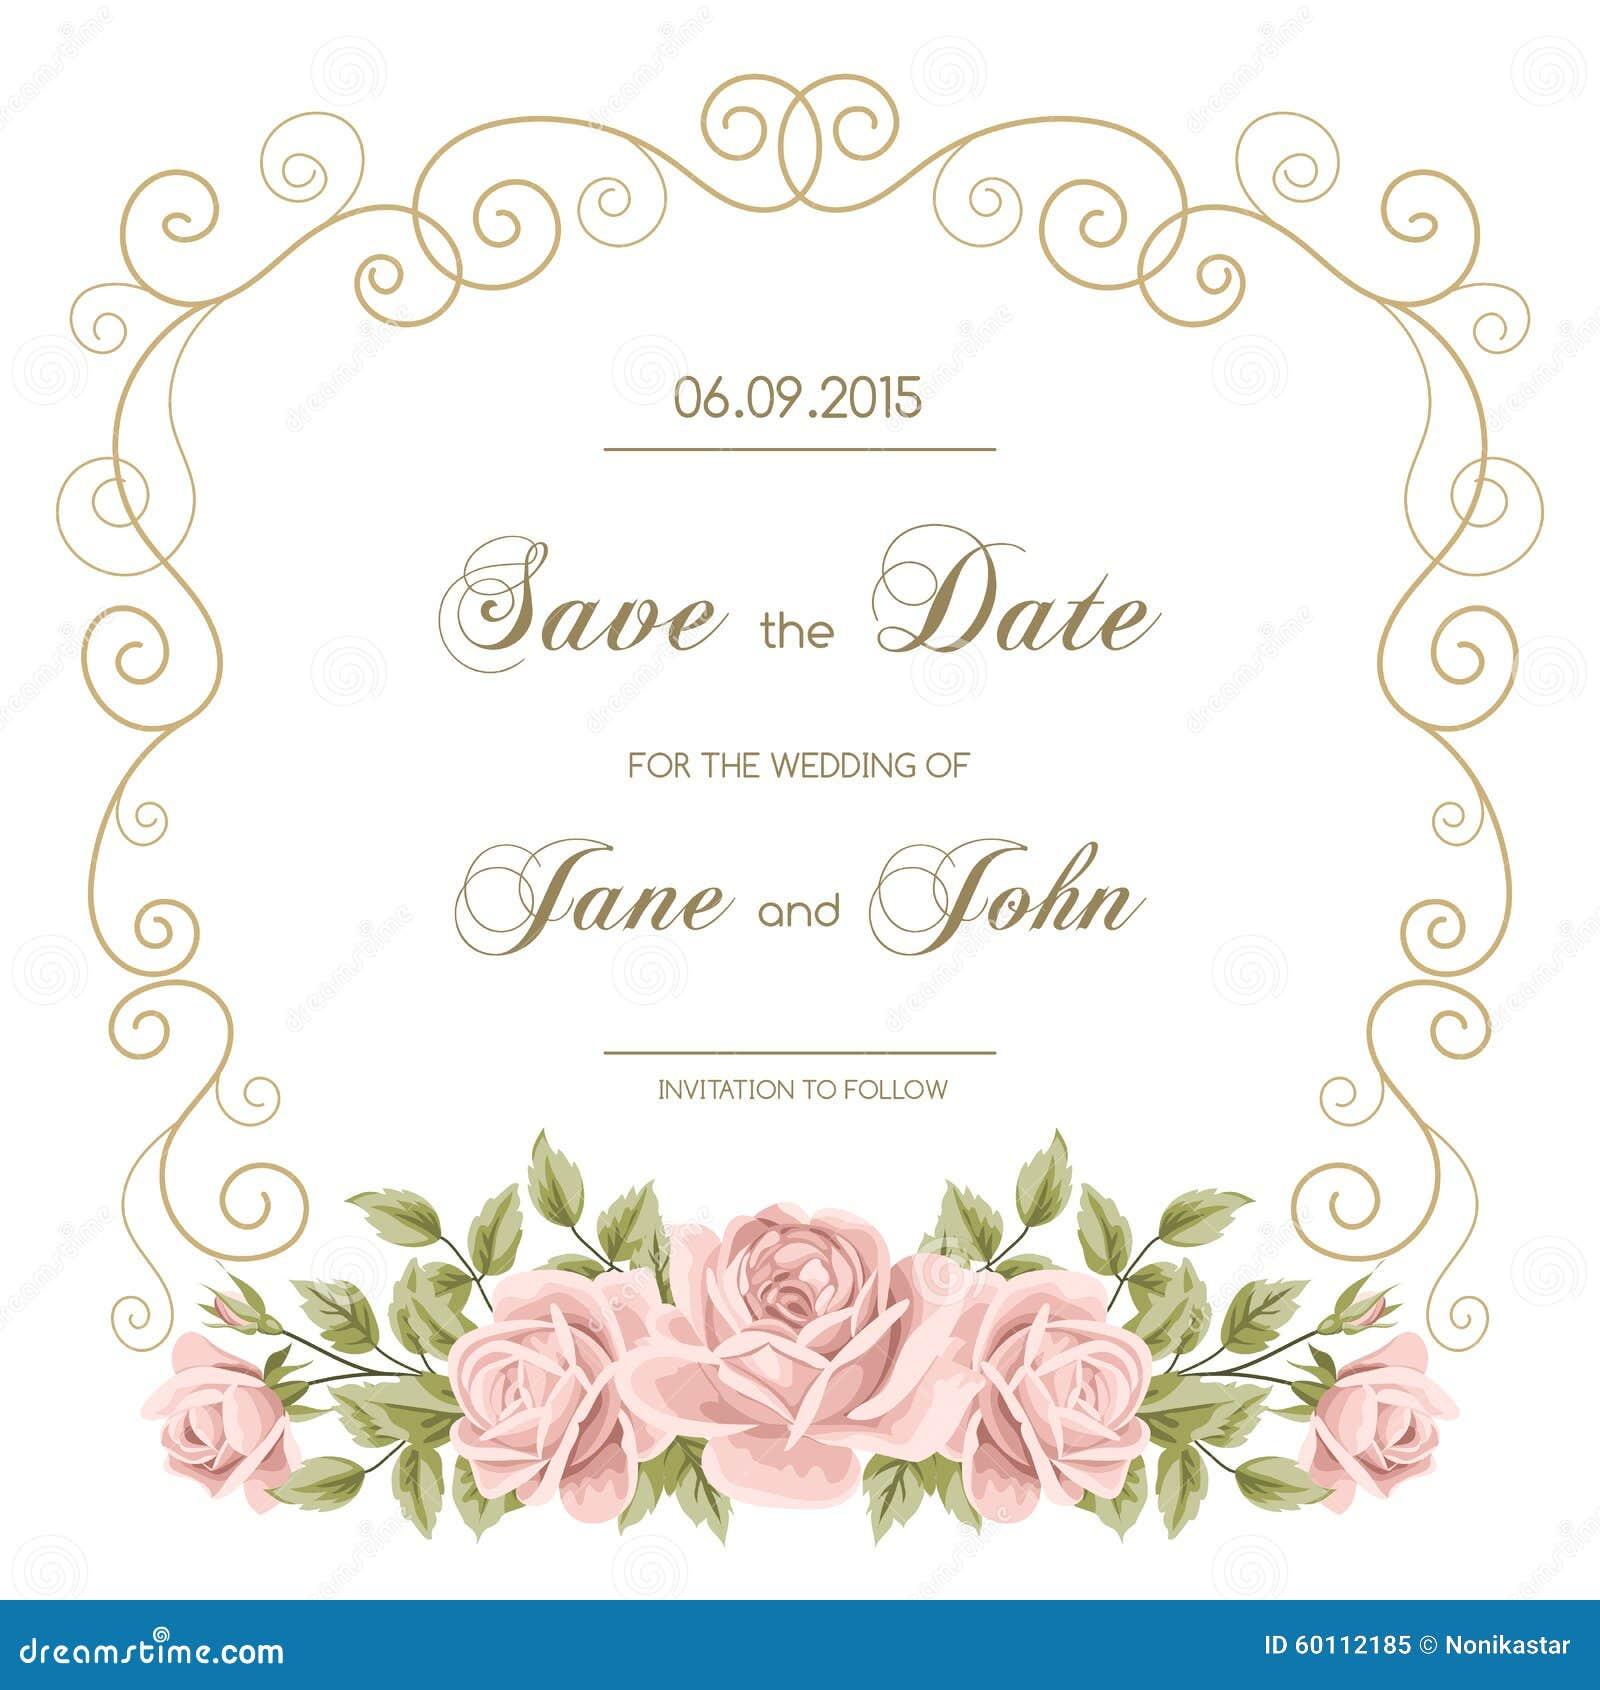 vintage wedding invitation with roses stock vector image 60112185. Black Bedroom Furniture Sets. Home Design Ideas